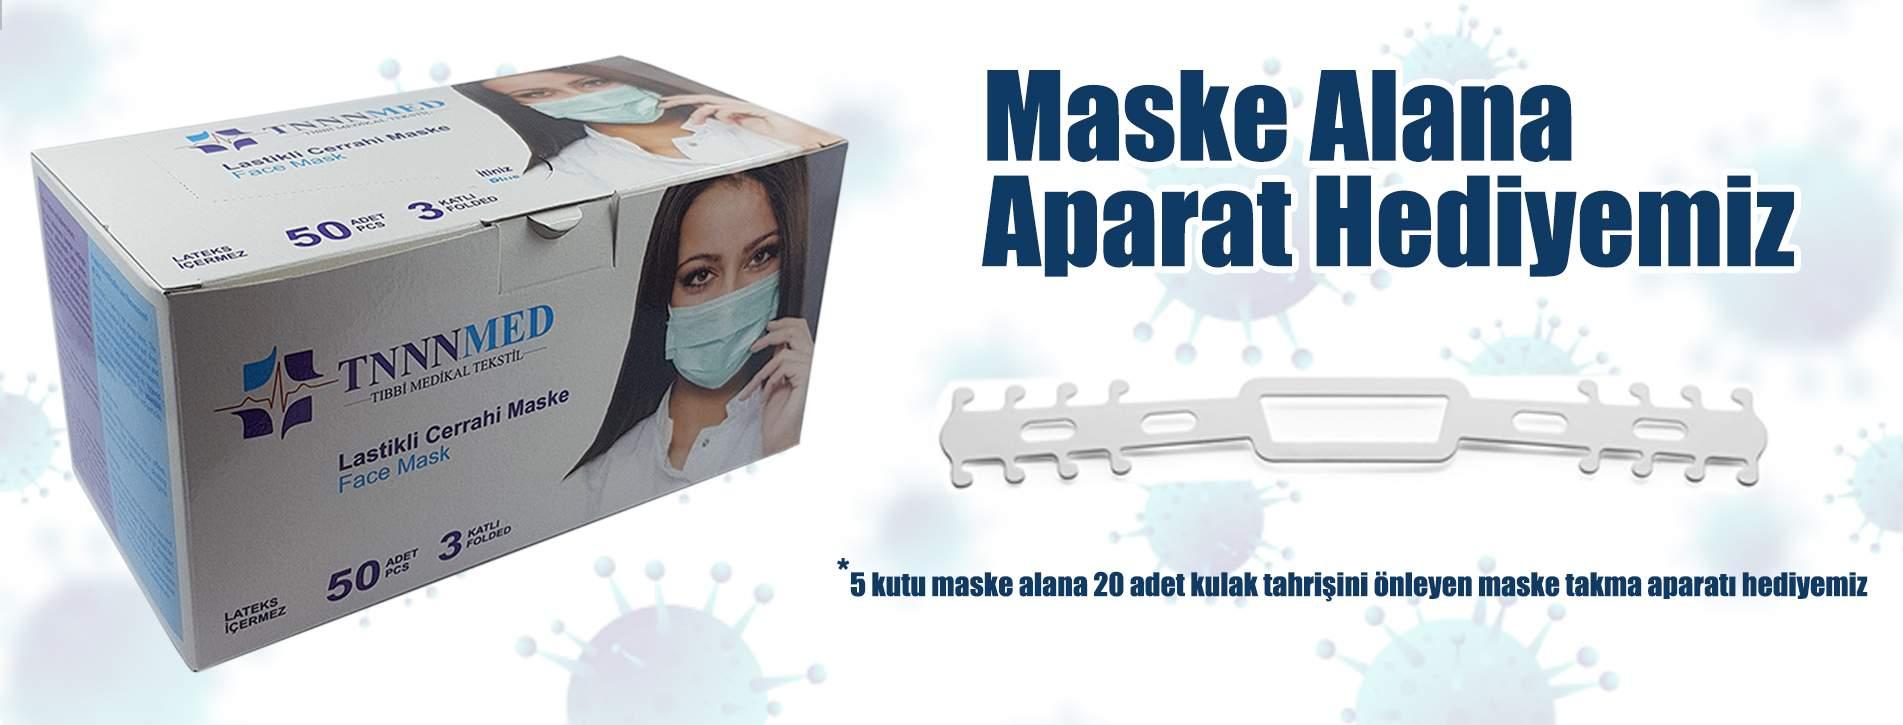 Maske ve Takma Aparatı